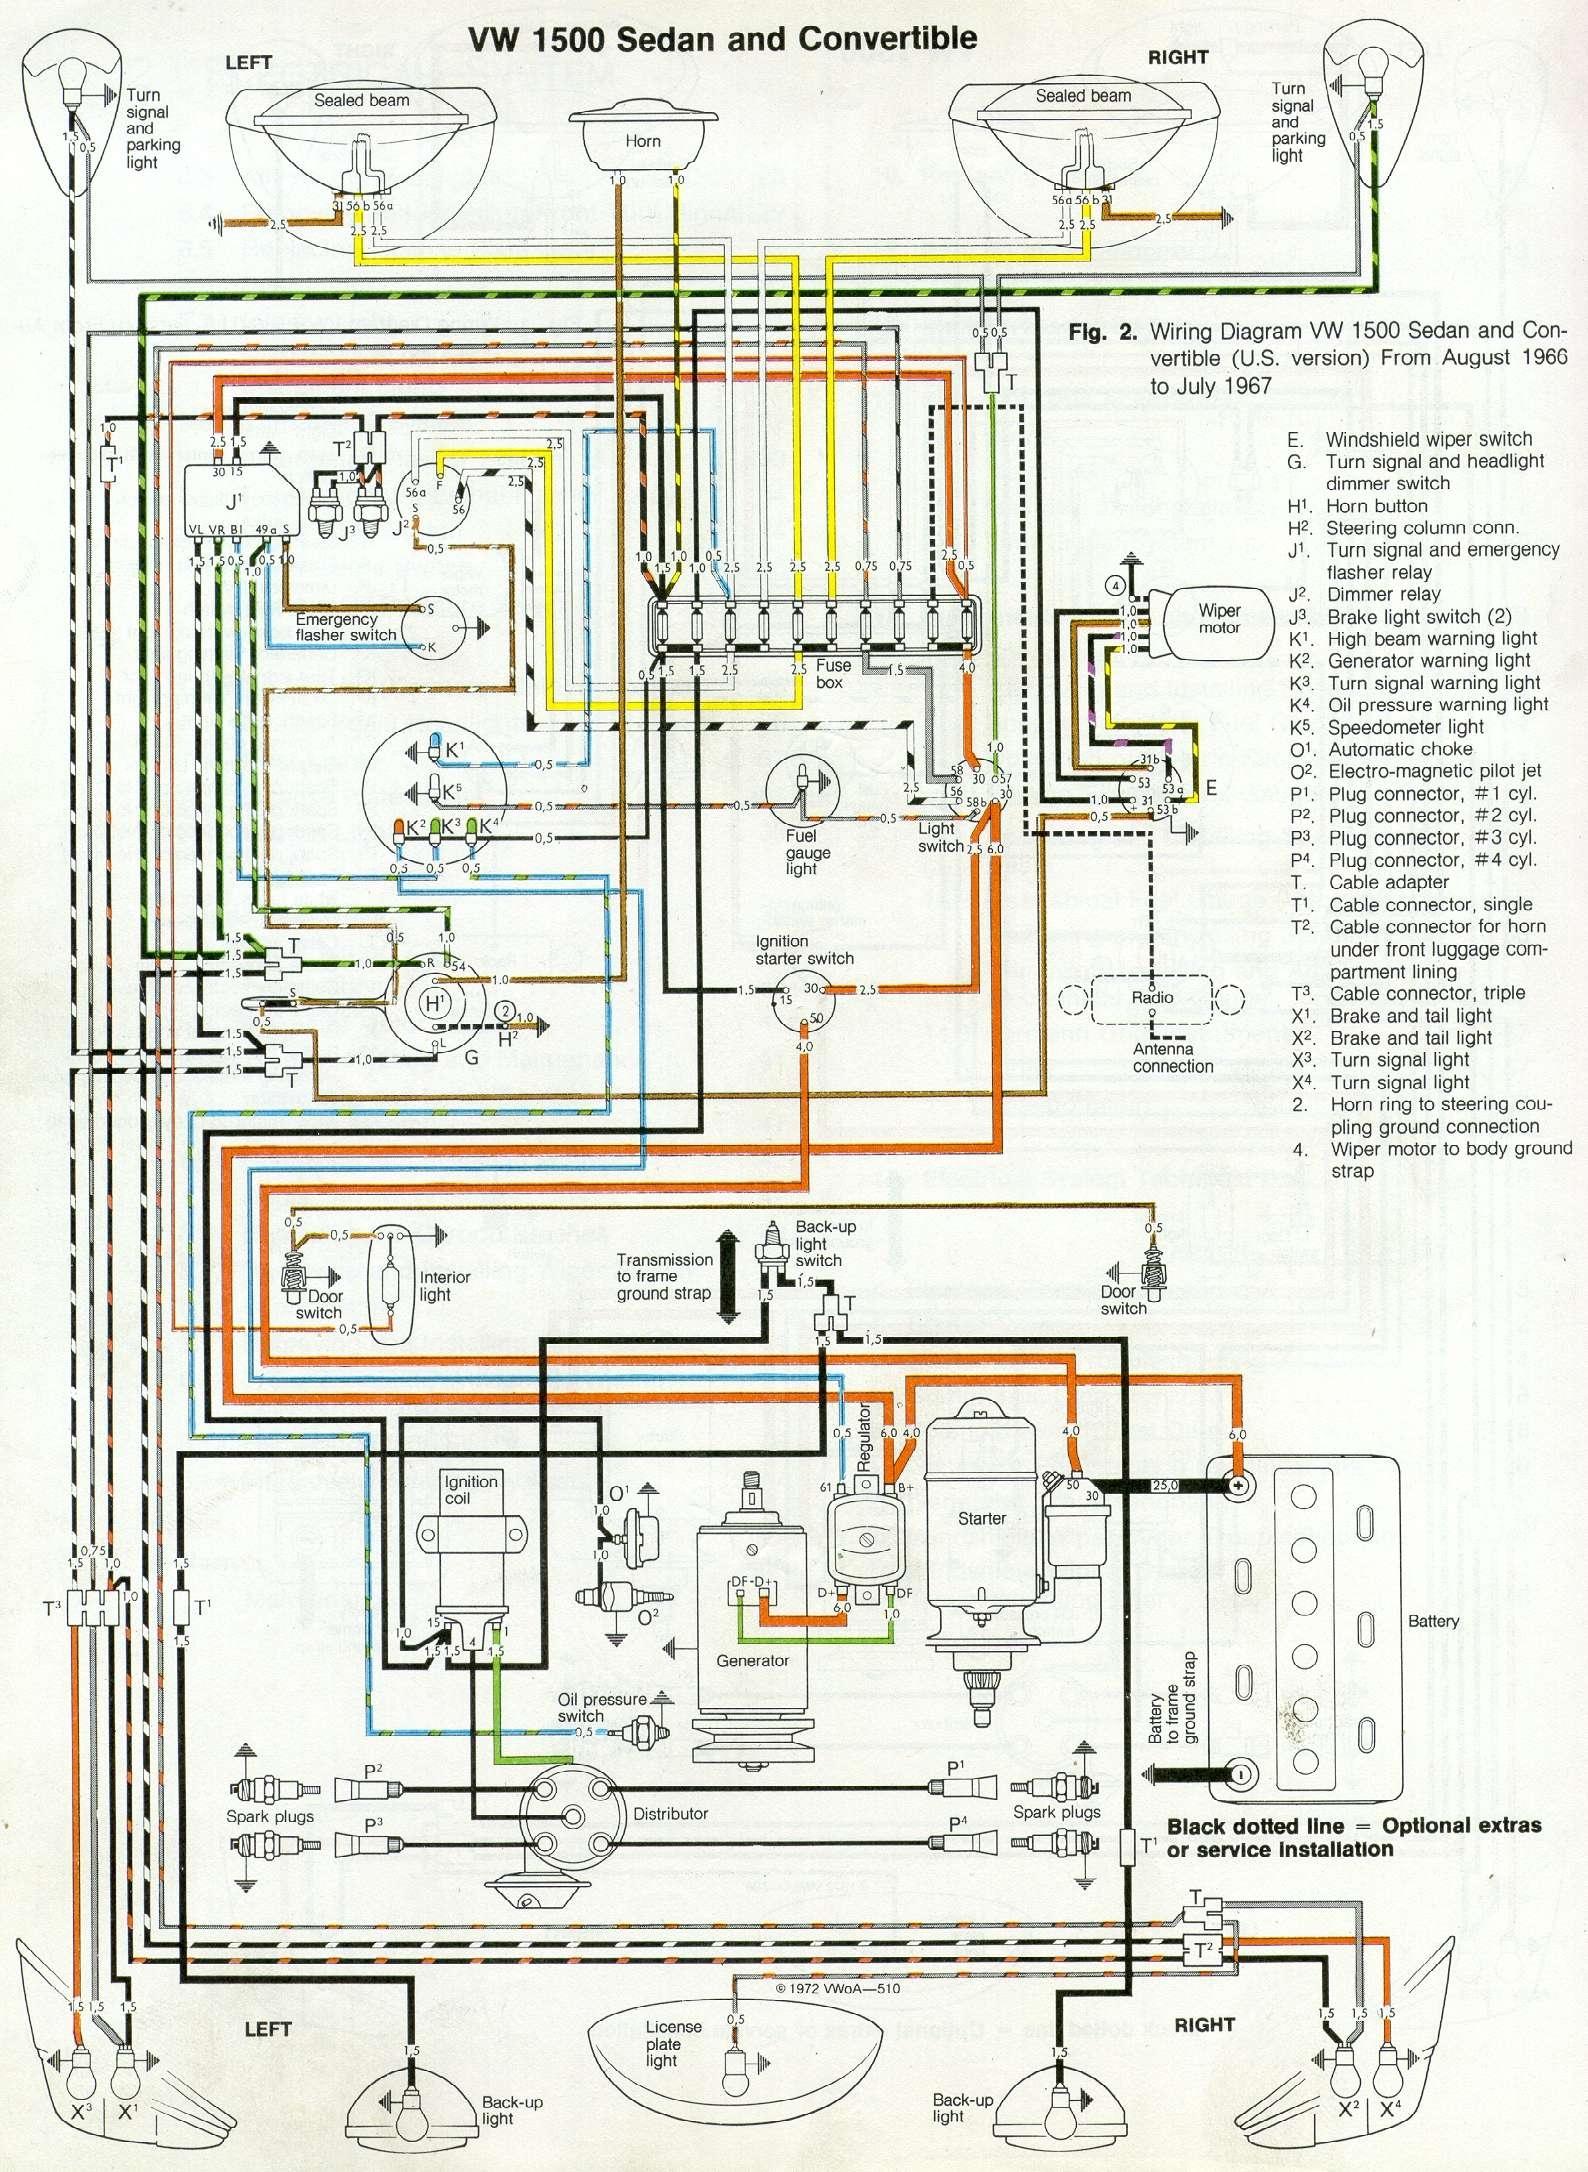 66 and 67 vw beetle wiring diagram rh 1967beetle com VW Bug Wiring Kit VW Bug Alternator Wiring